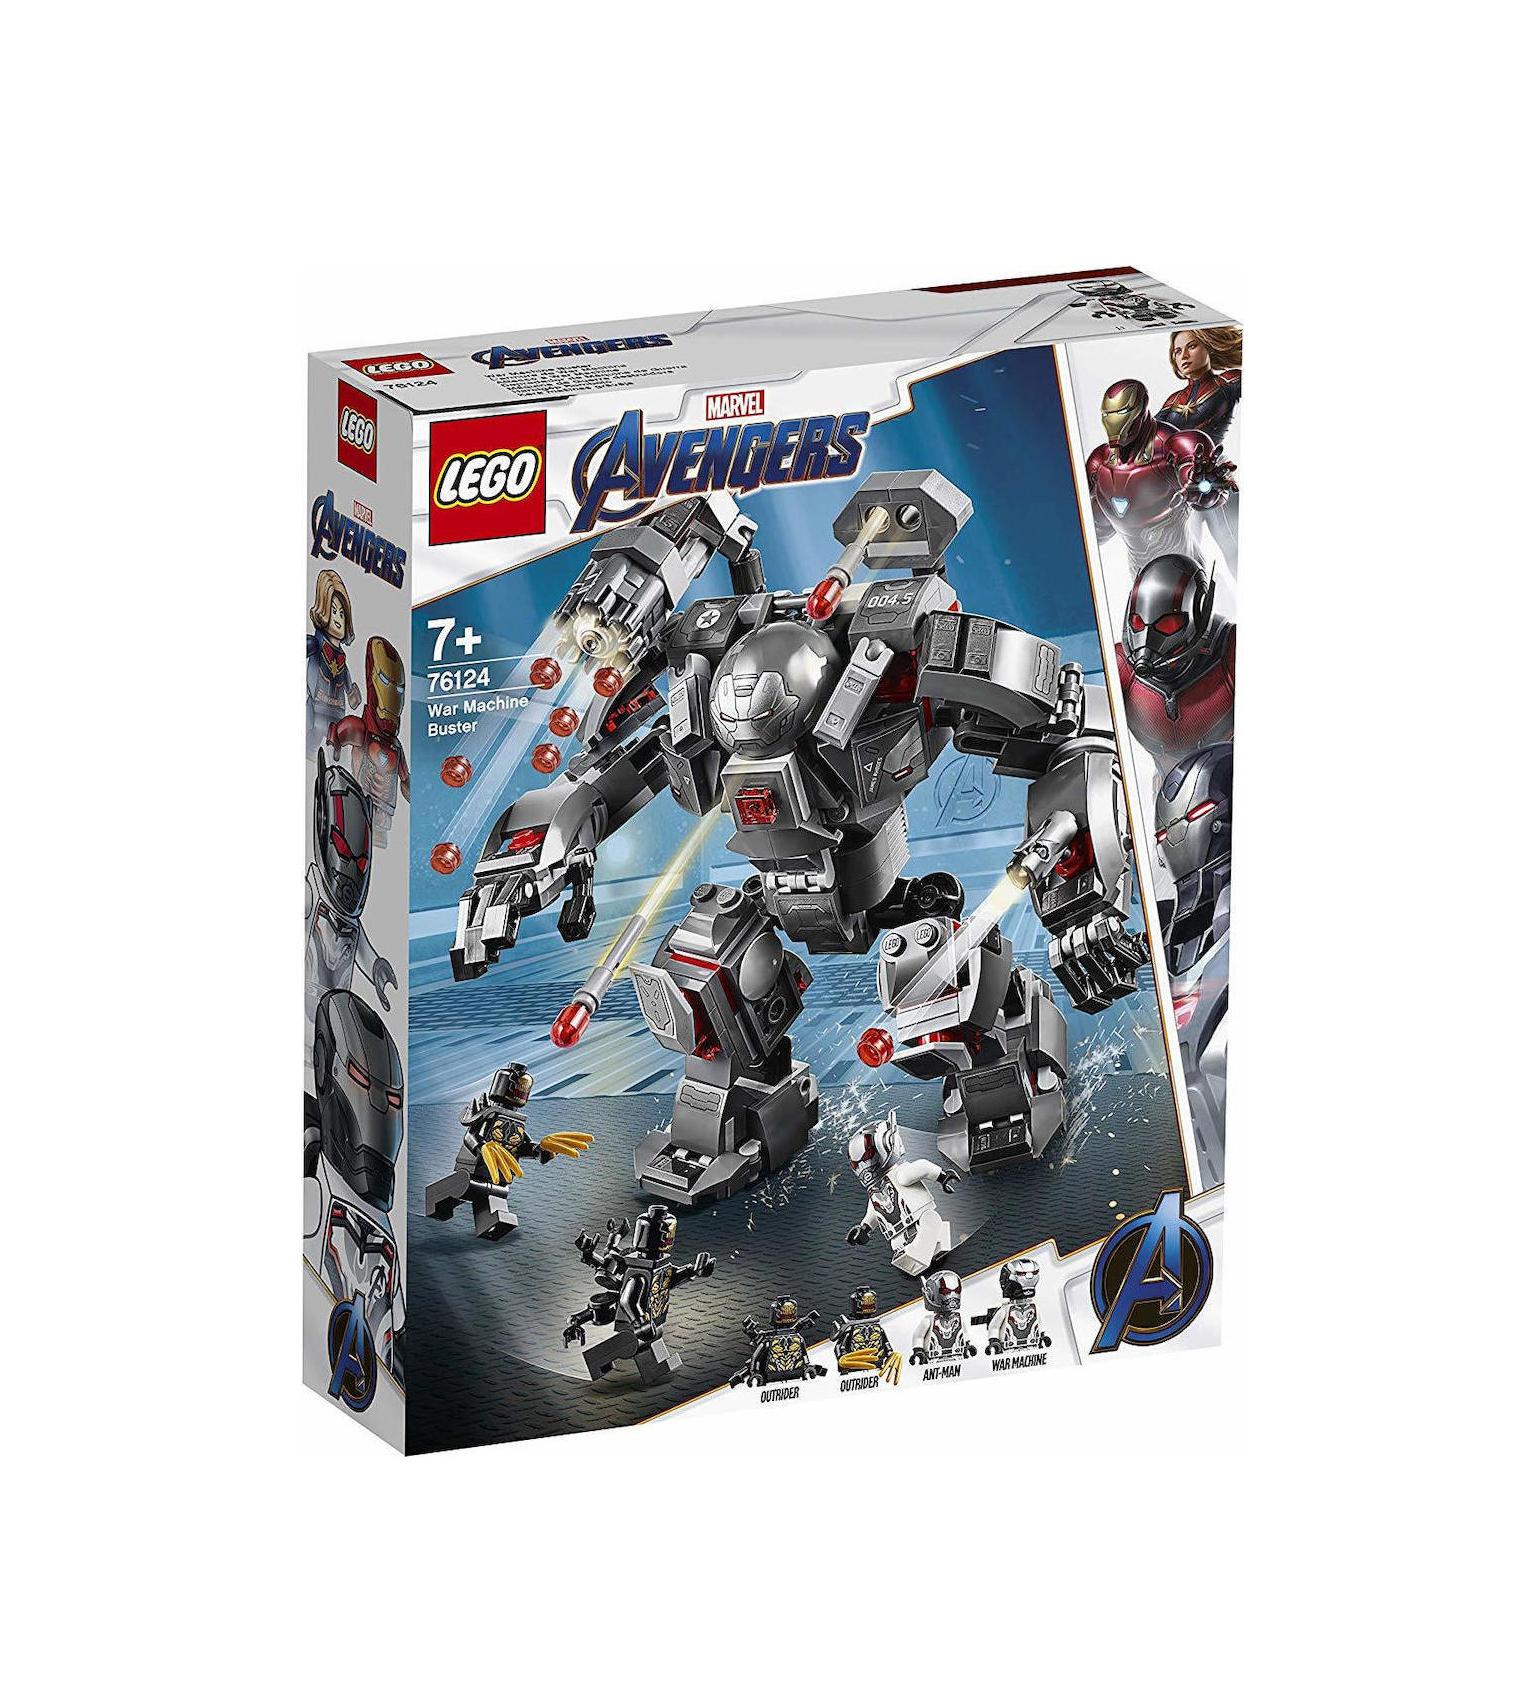 Lego Super Heroes: War Machine Buster 76124